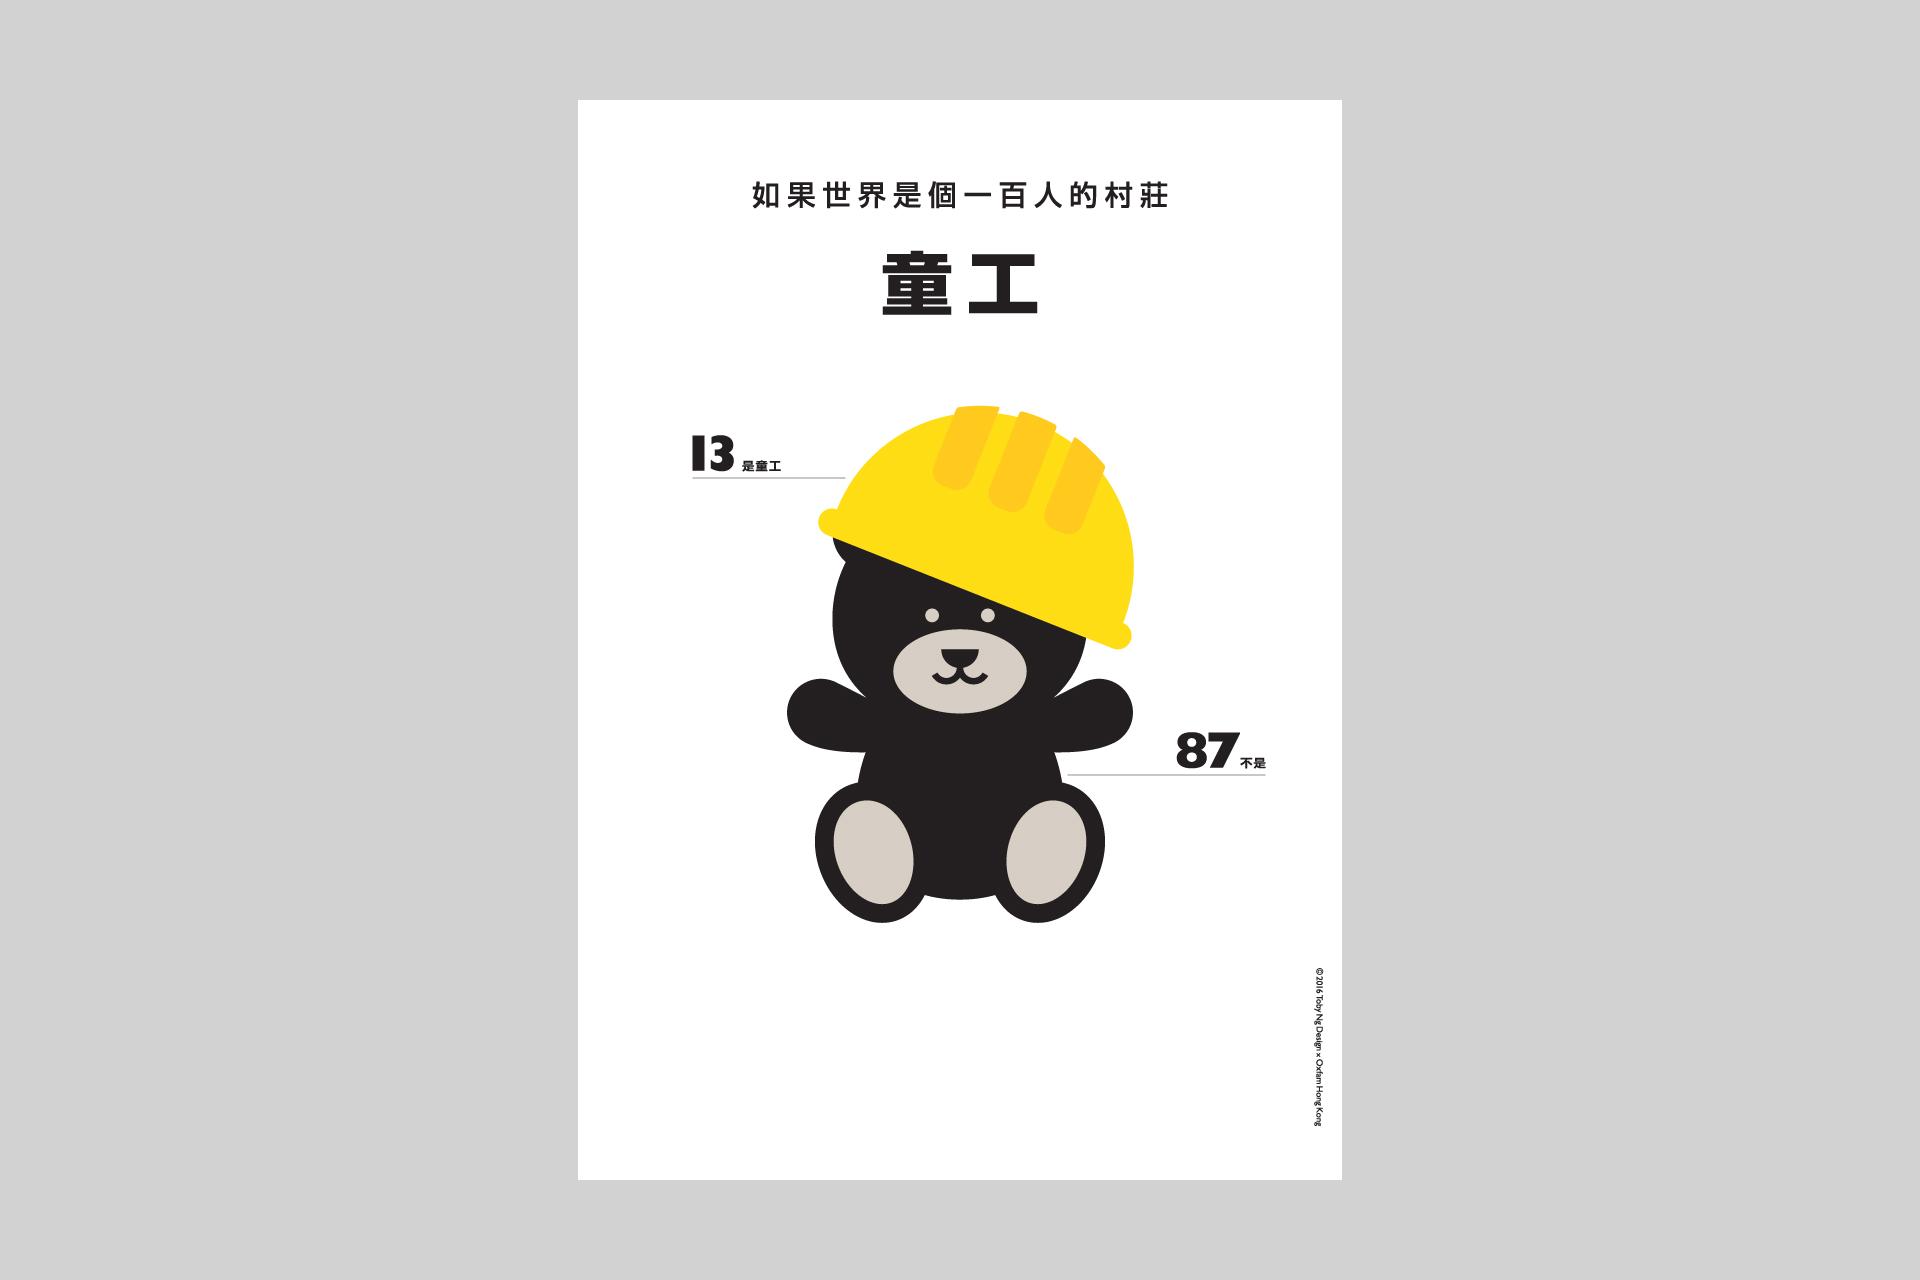 the-world-of-100-x-oxfam-hong-kong_13